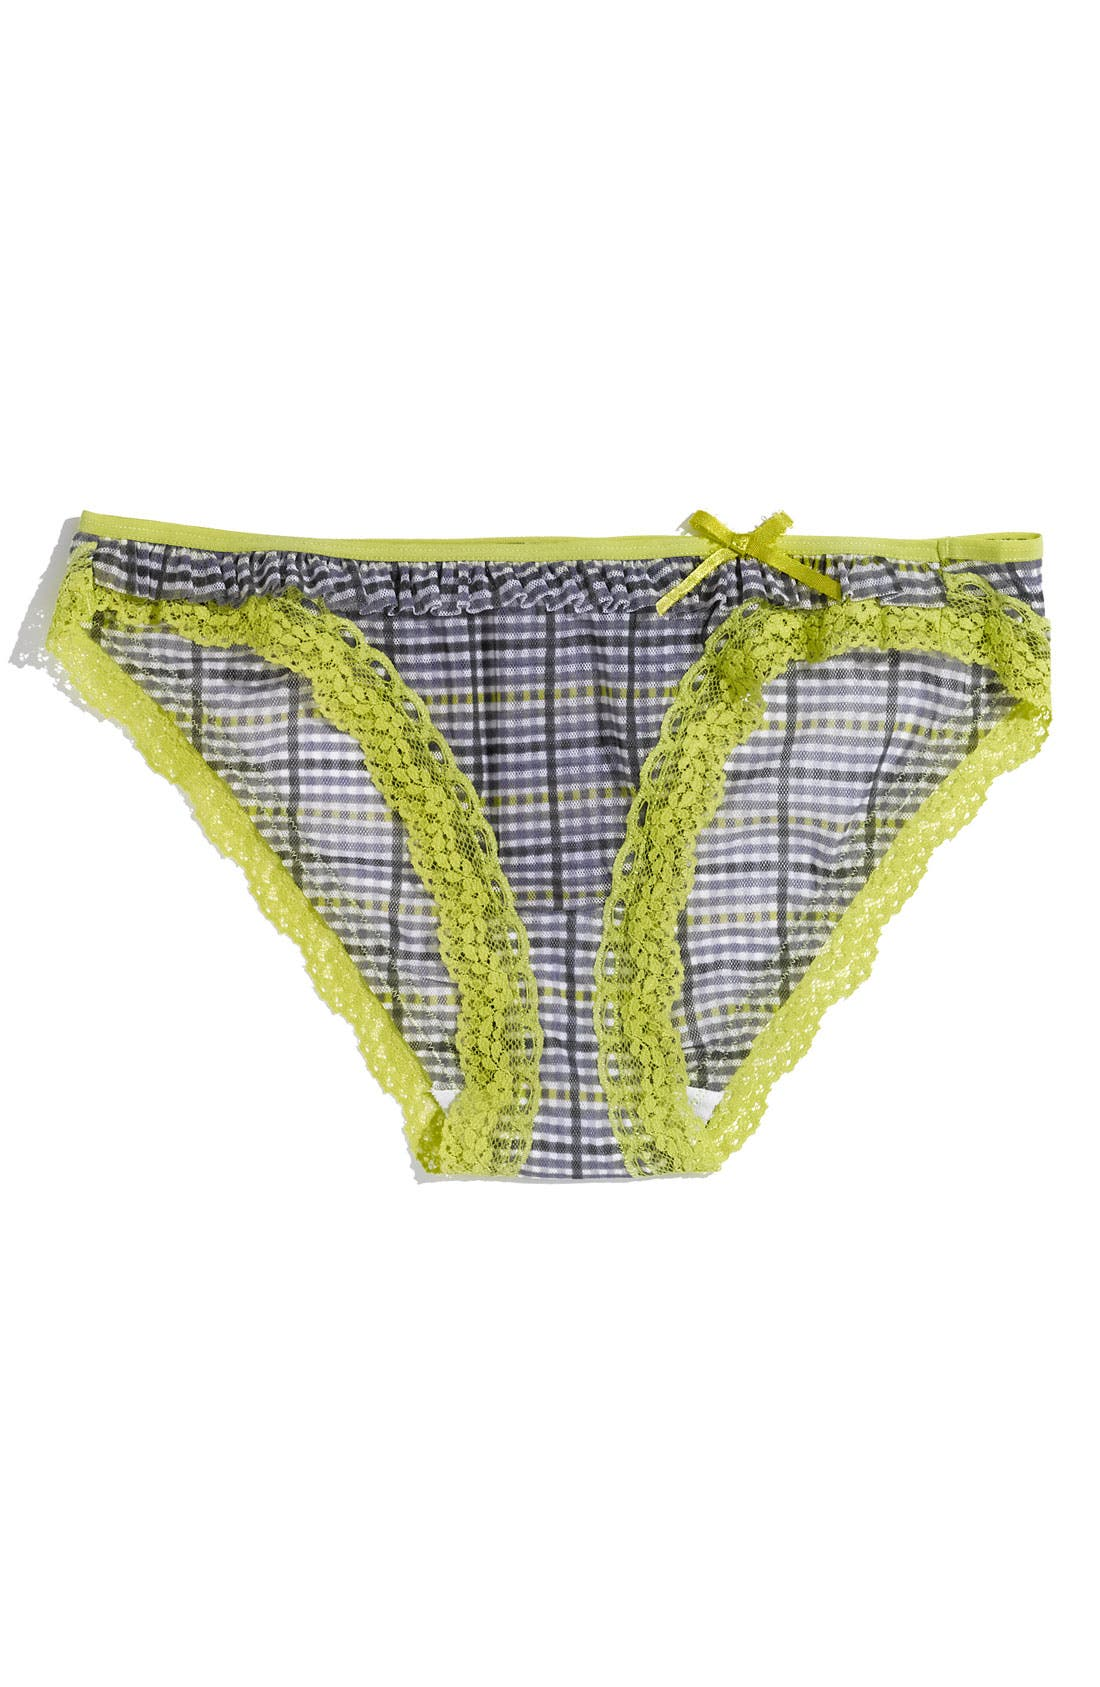 Alternate Image 1 Selected - DKNY 'Fancy Frills' Bikini